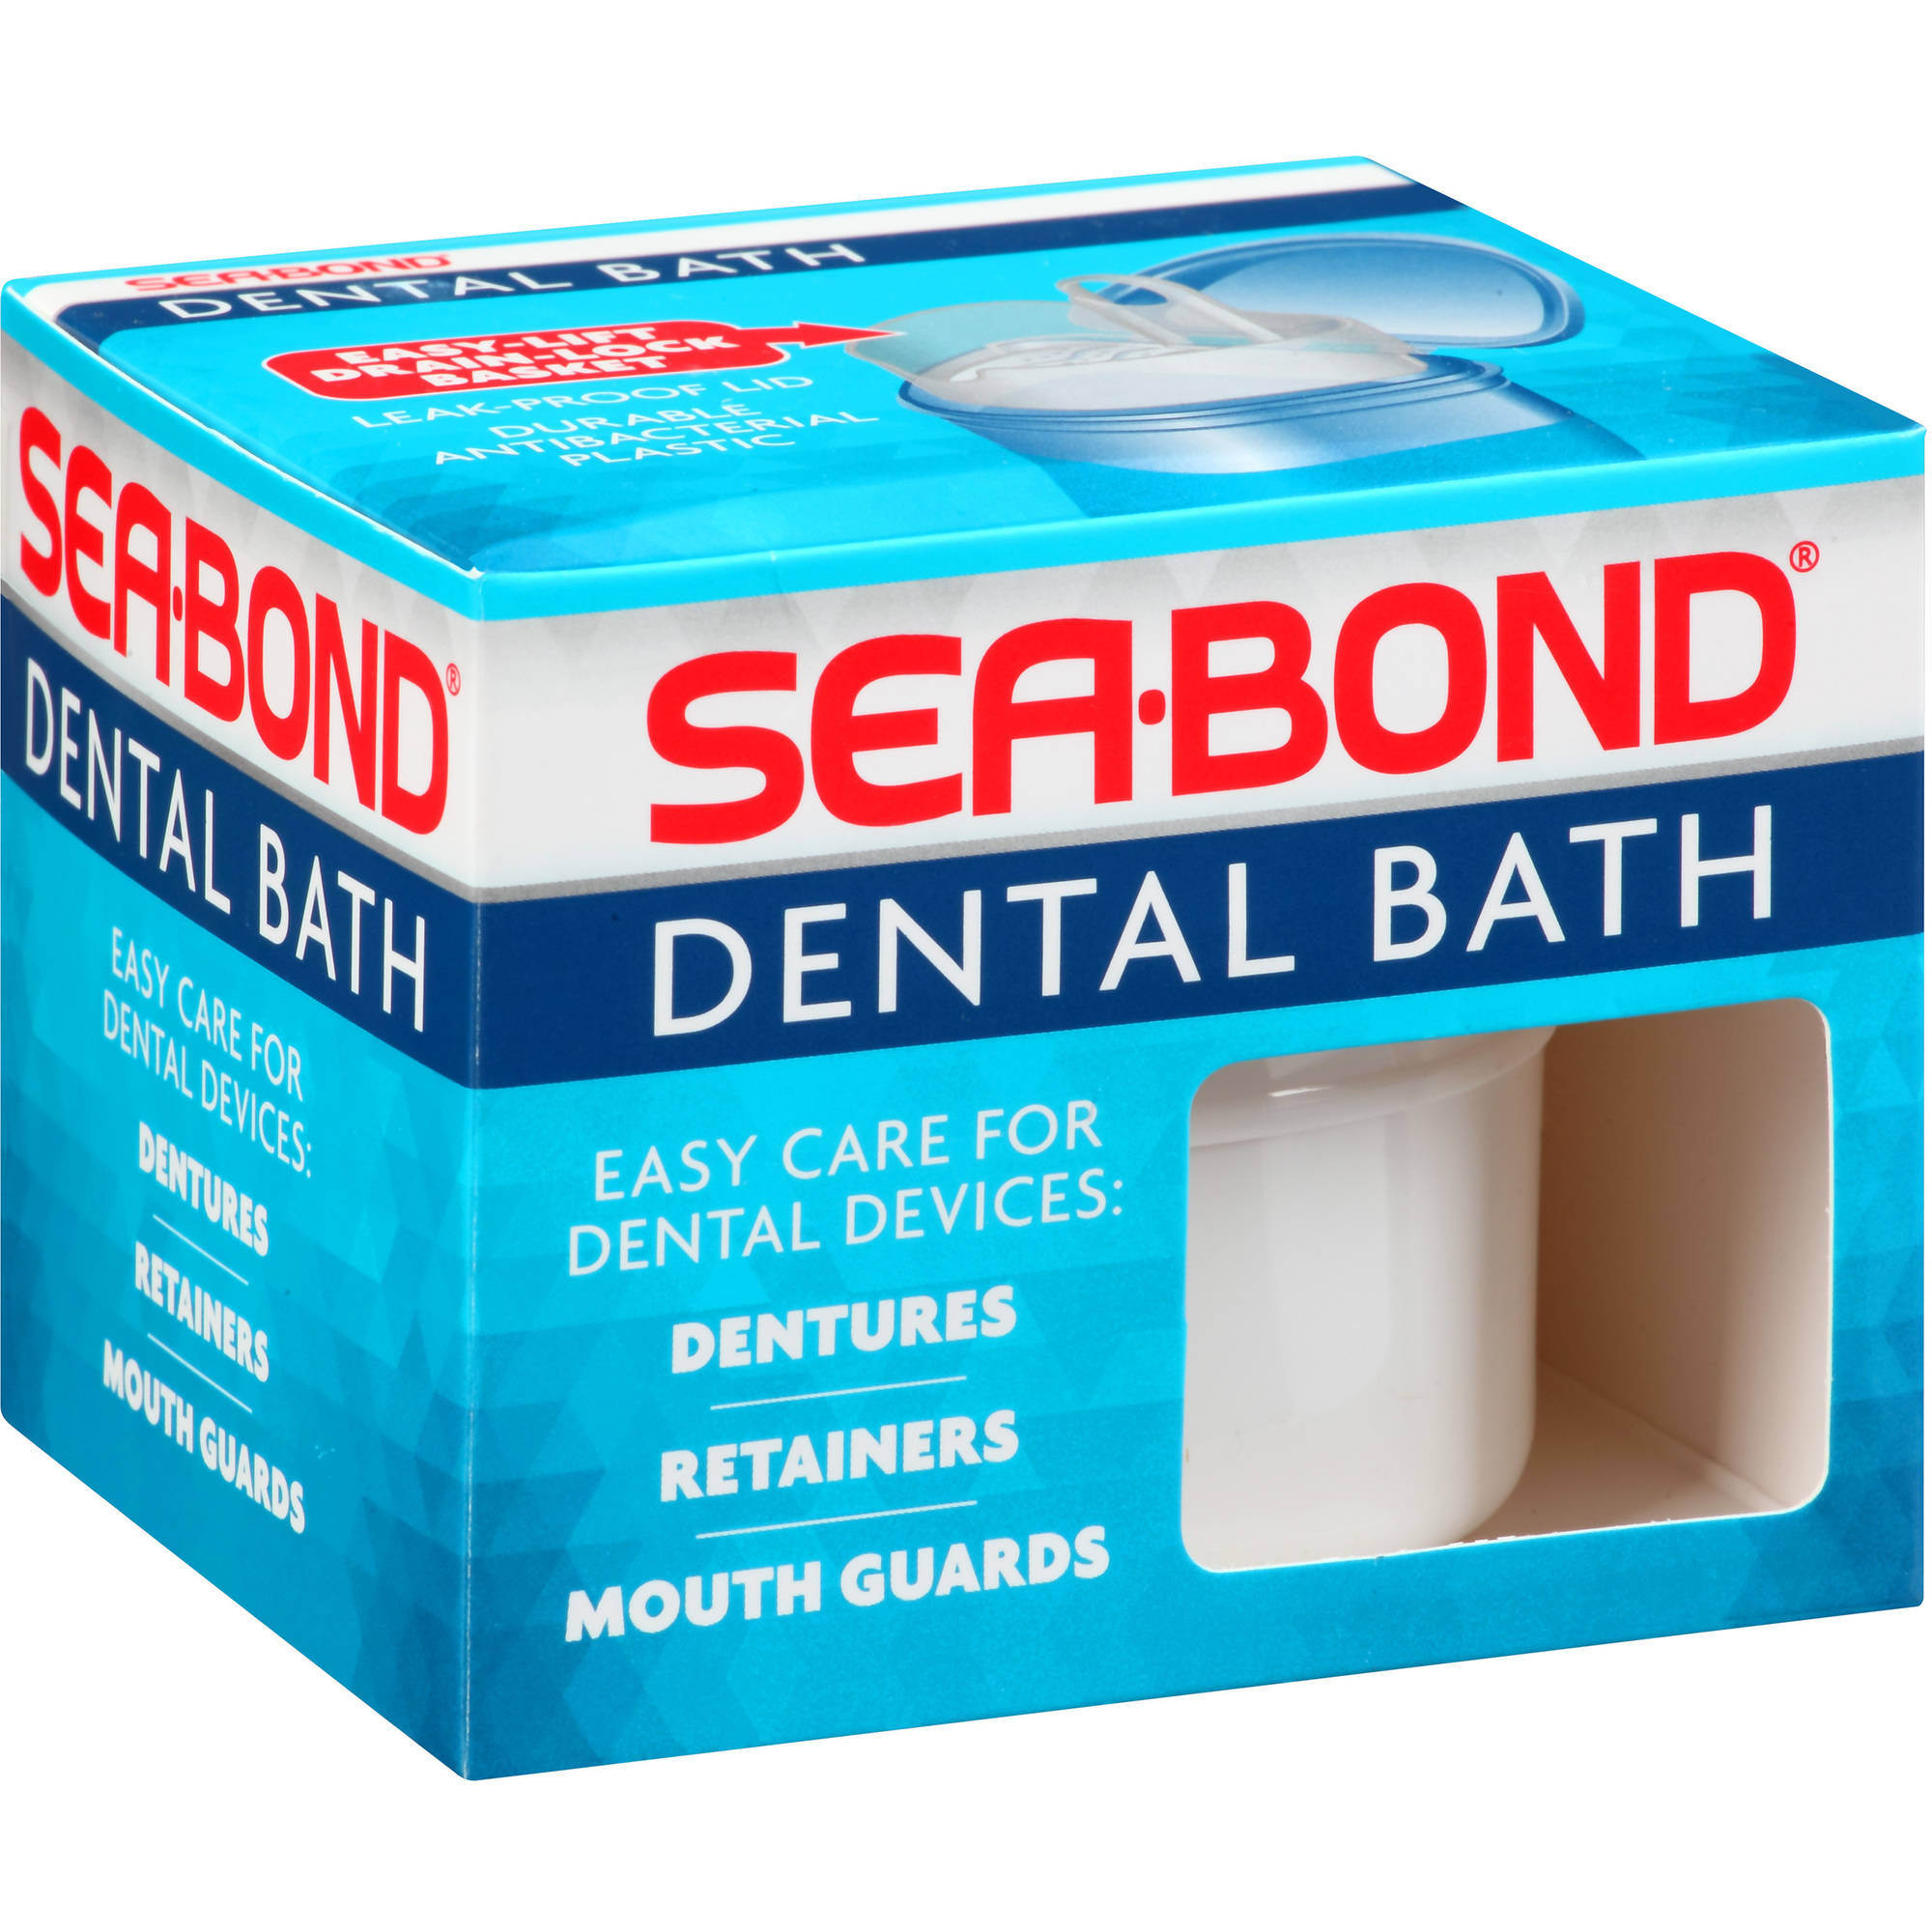 Sea-Bond Dental Bath, 1.0 CT